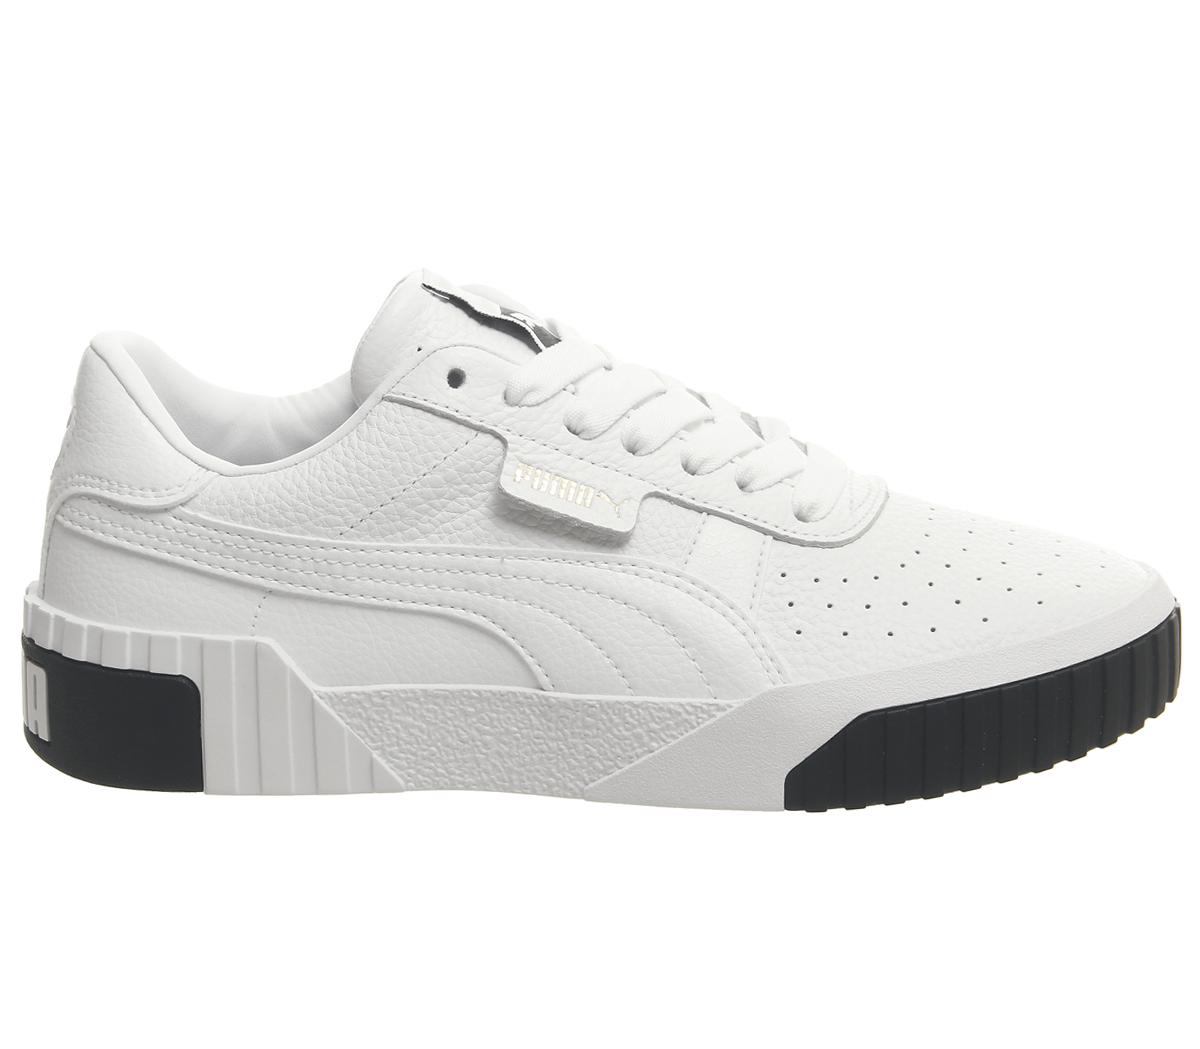 Mujer Blanco Puma Negro Para Cali Zapatos Zapatillas 8x5gAqw